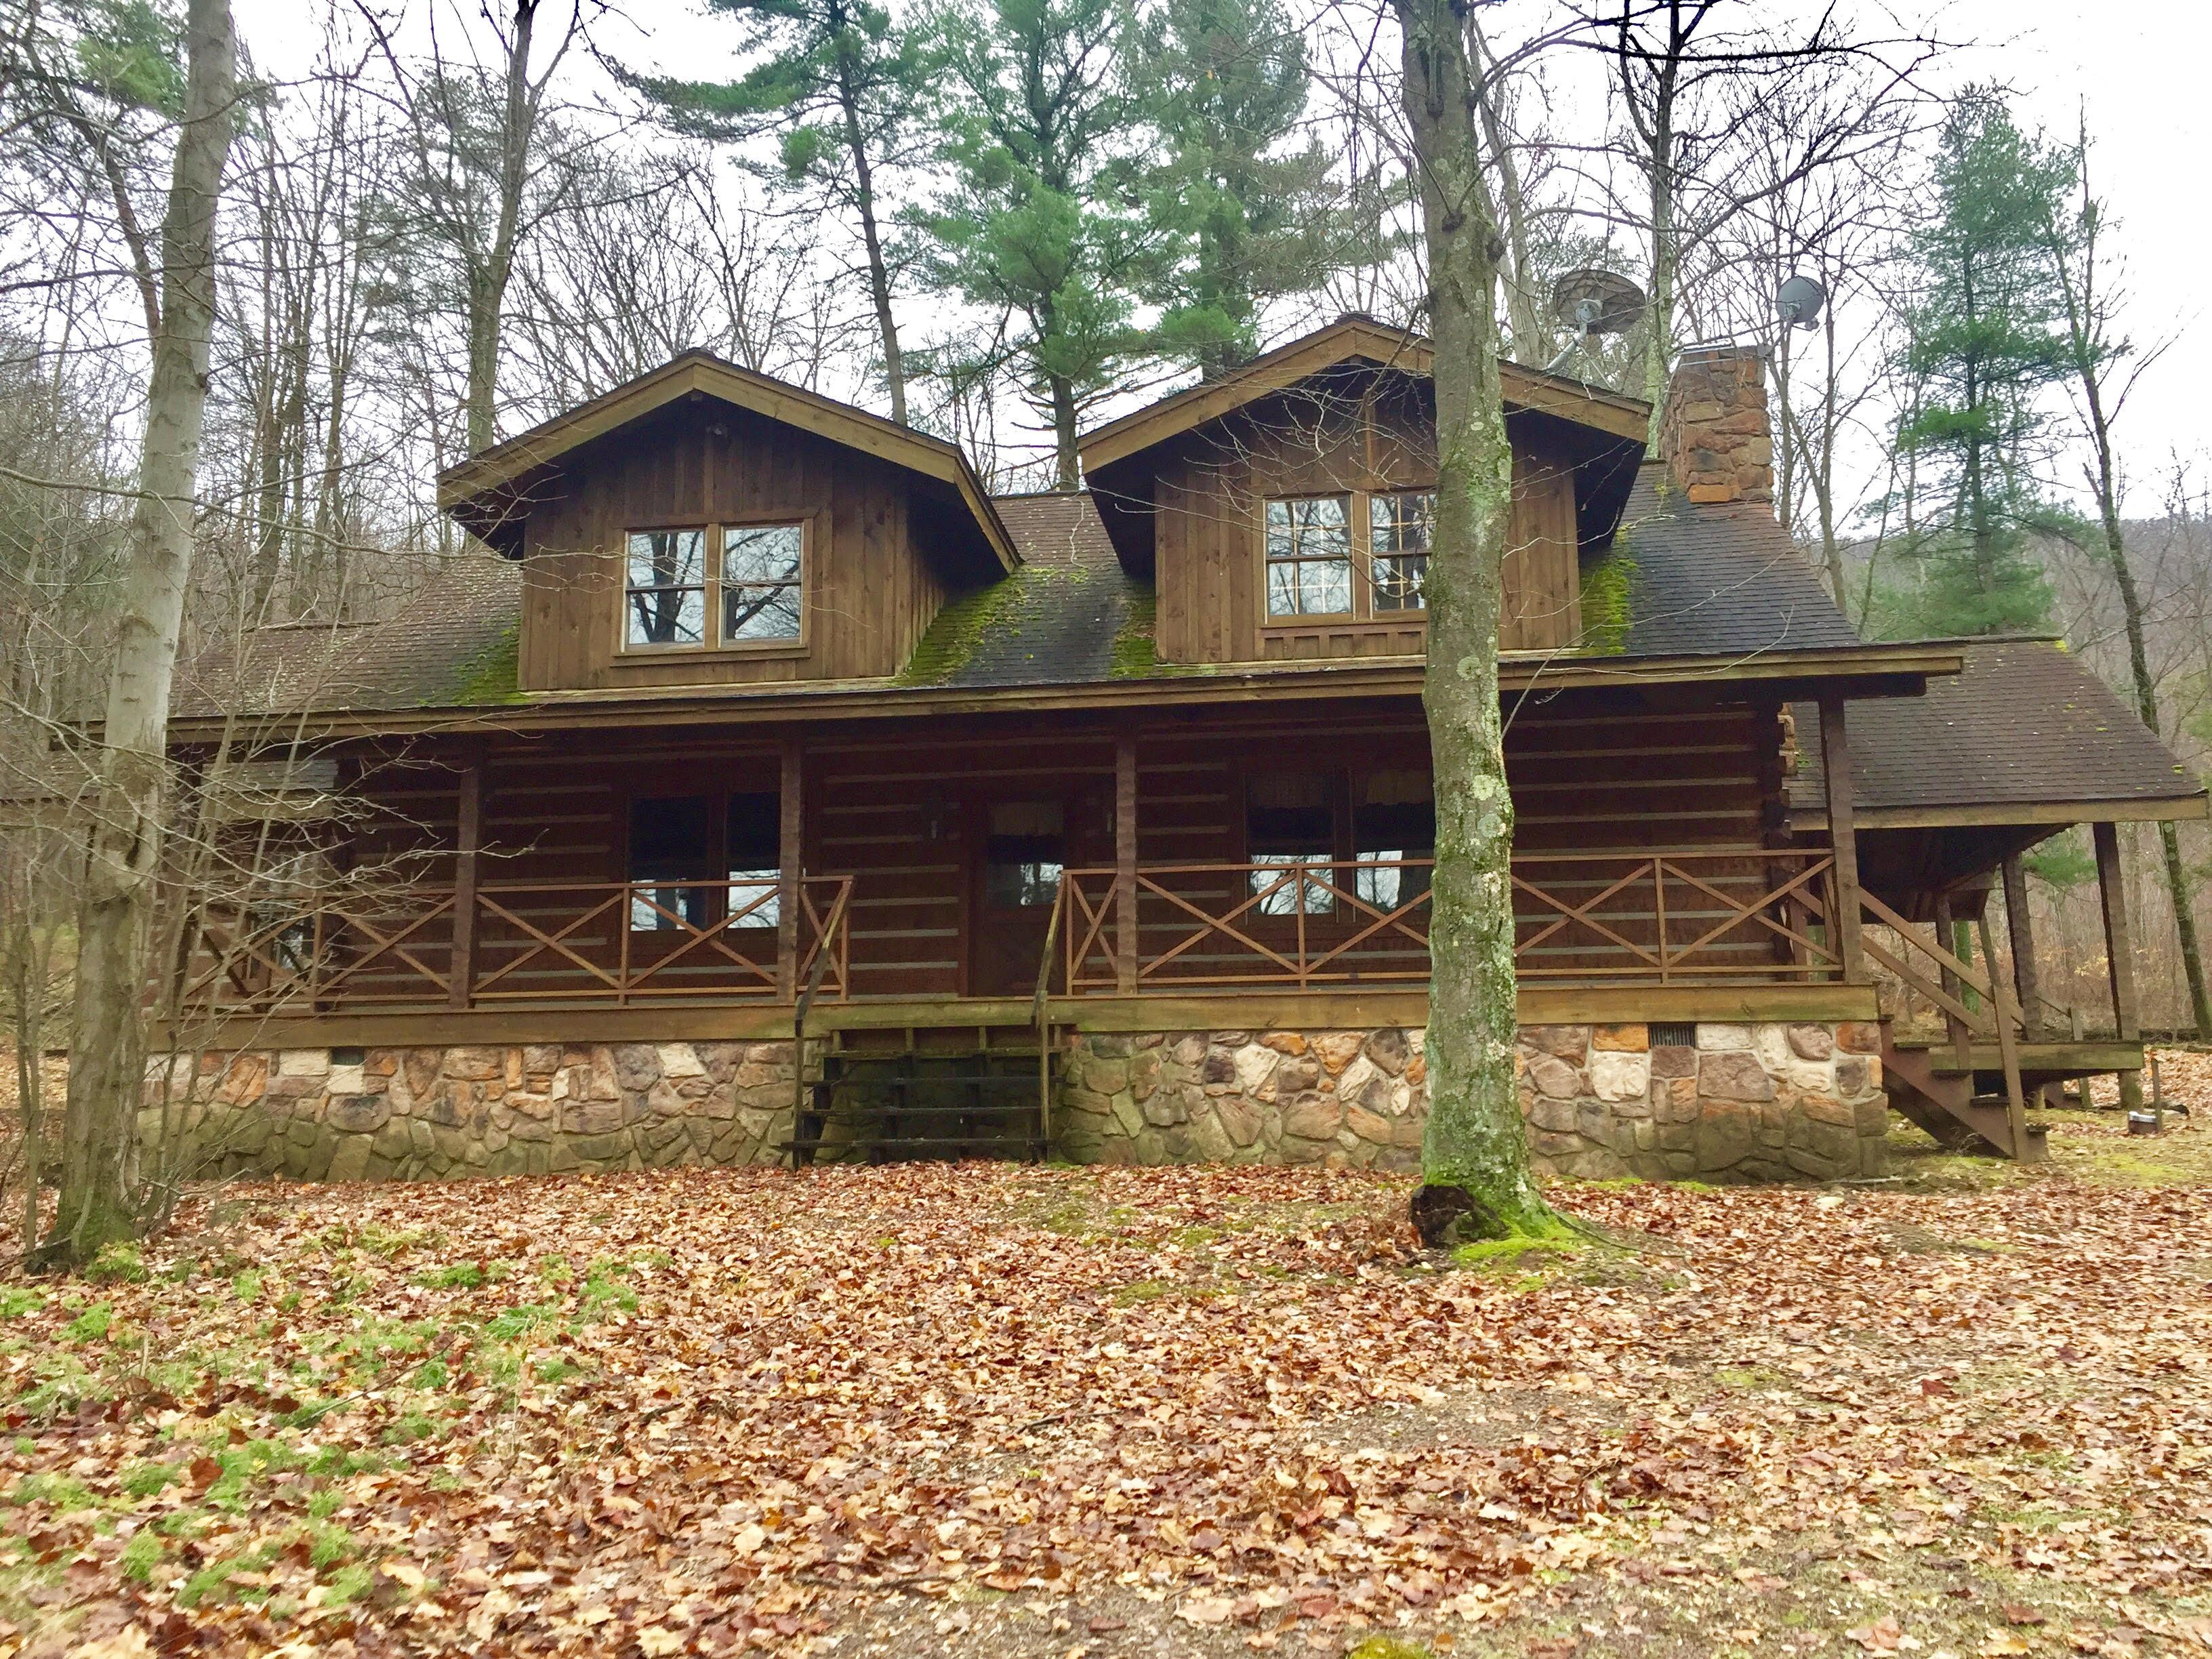 348 Acres Land, Log Cabin, Mifflinville, PA